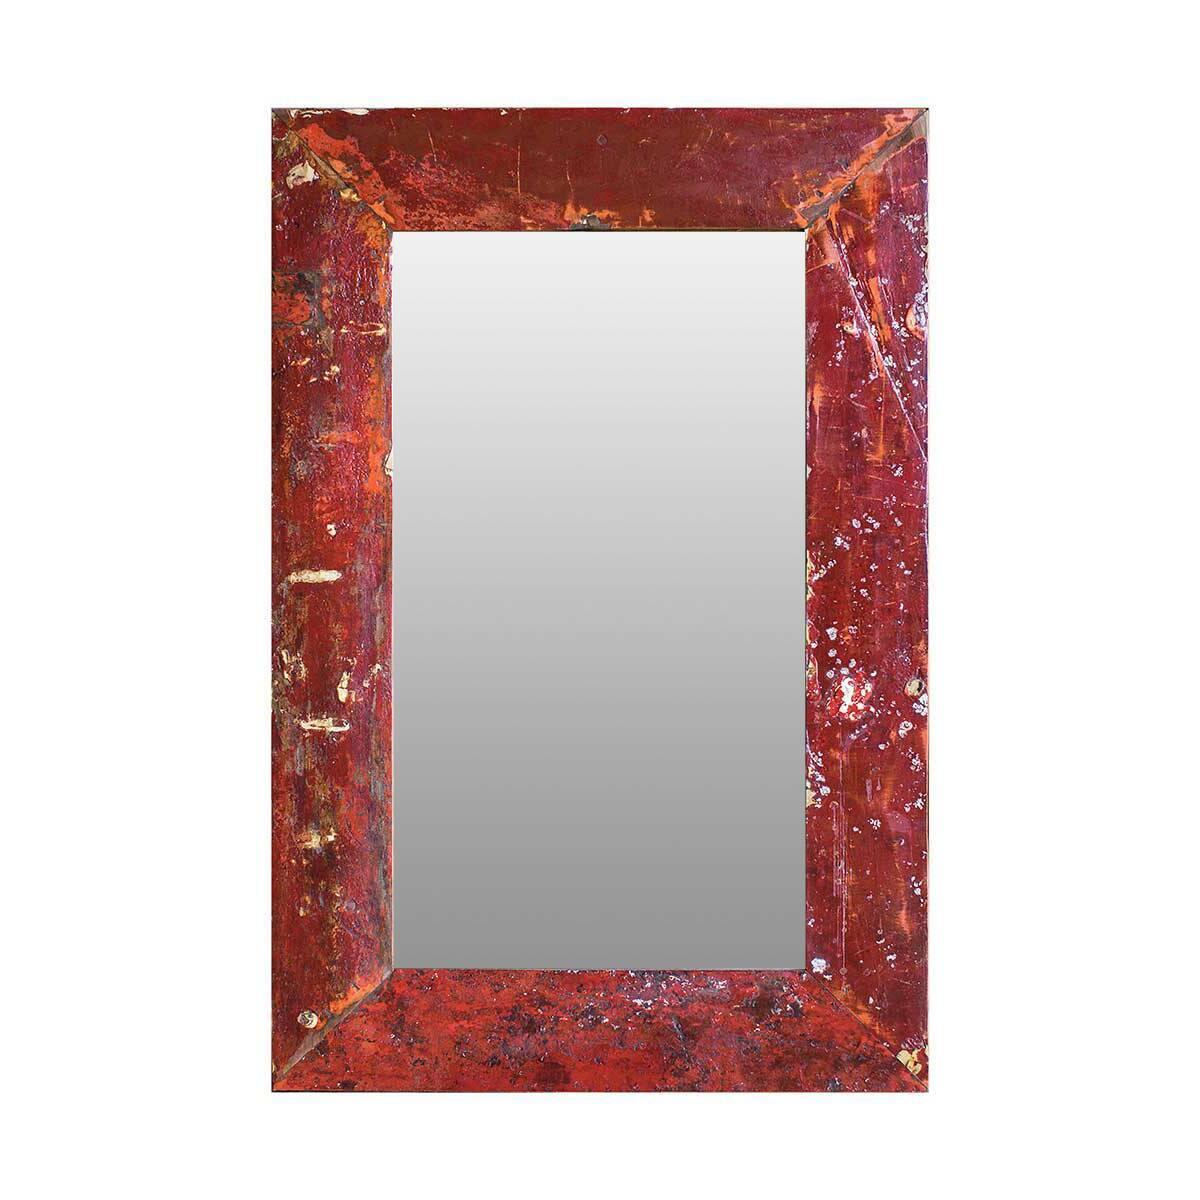 Зеркало Like Lodka 15576343 от Cosmorelax